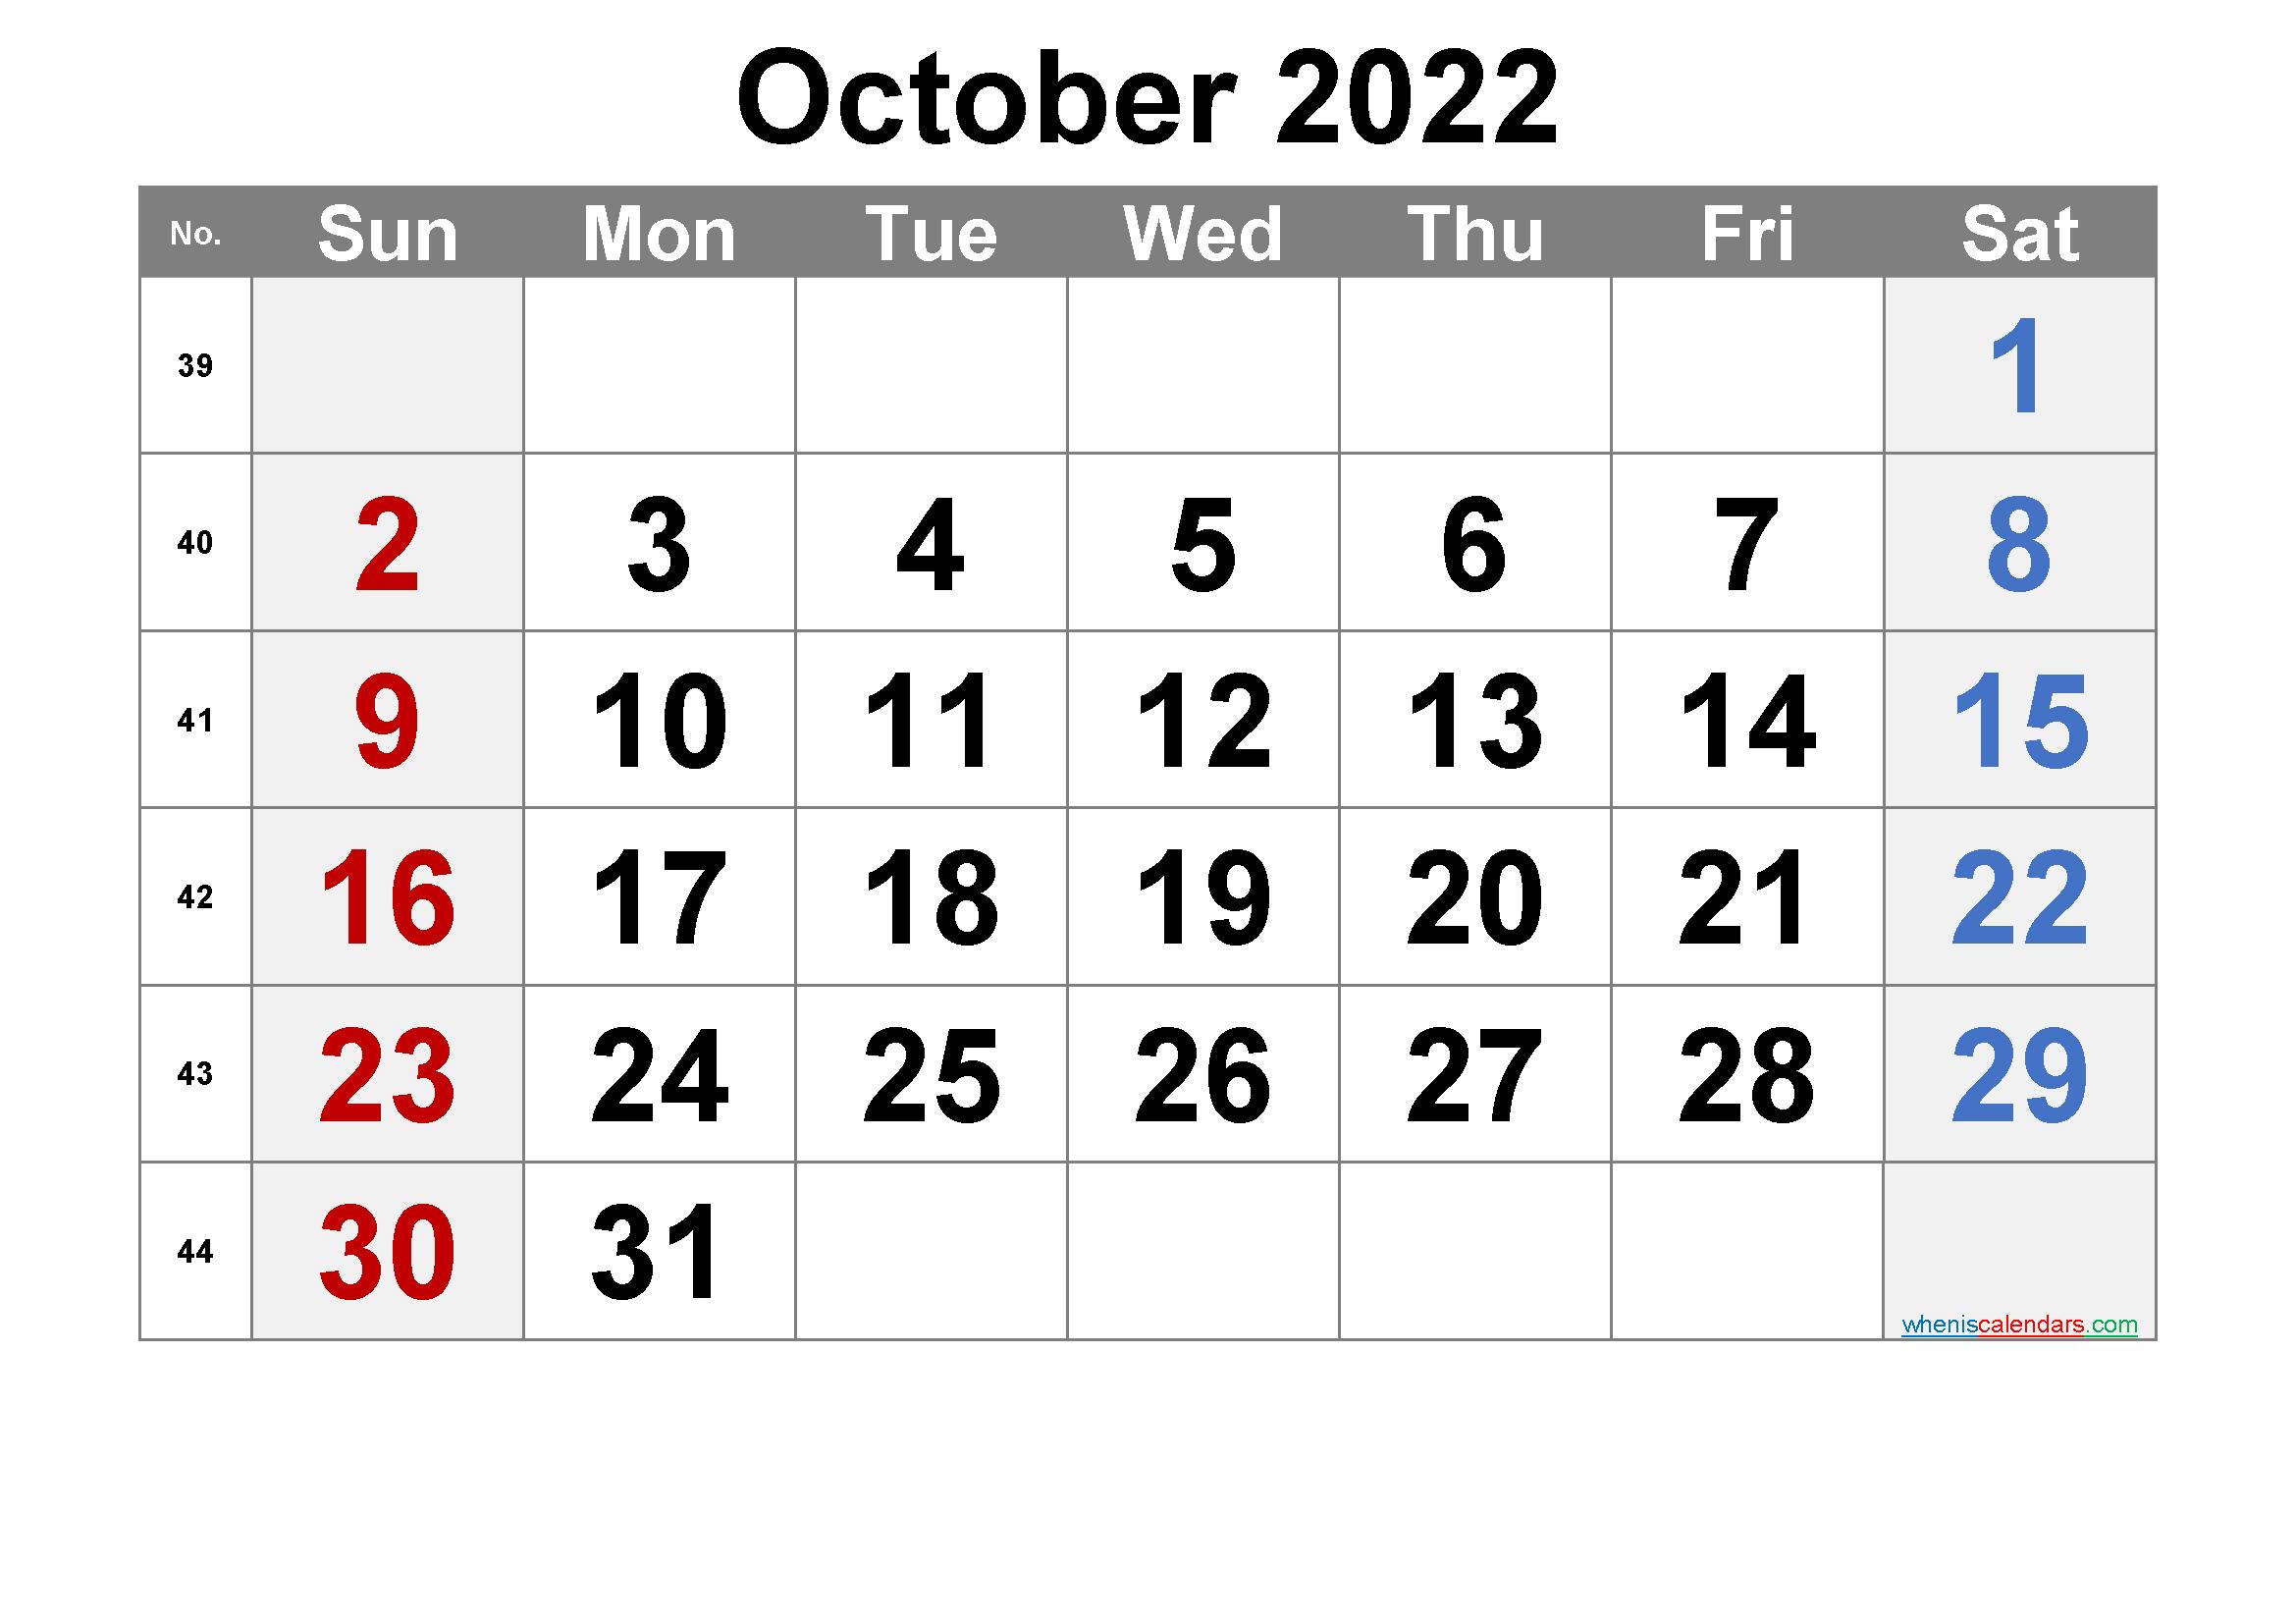 Free October 2022 Calendar with Week Numbers